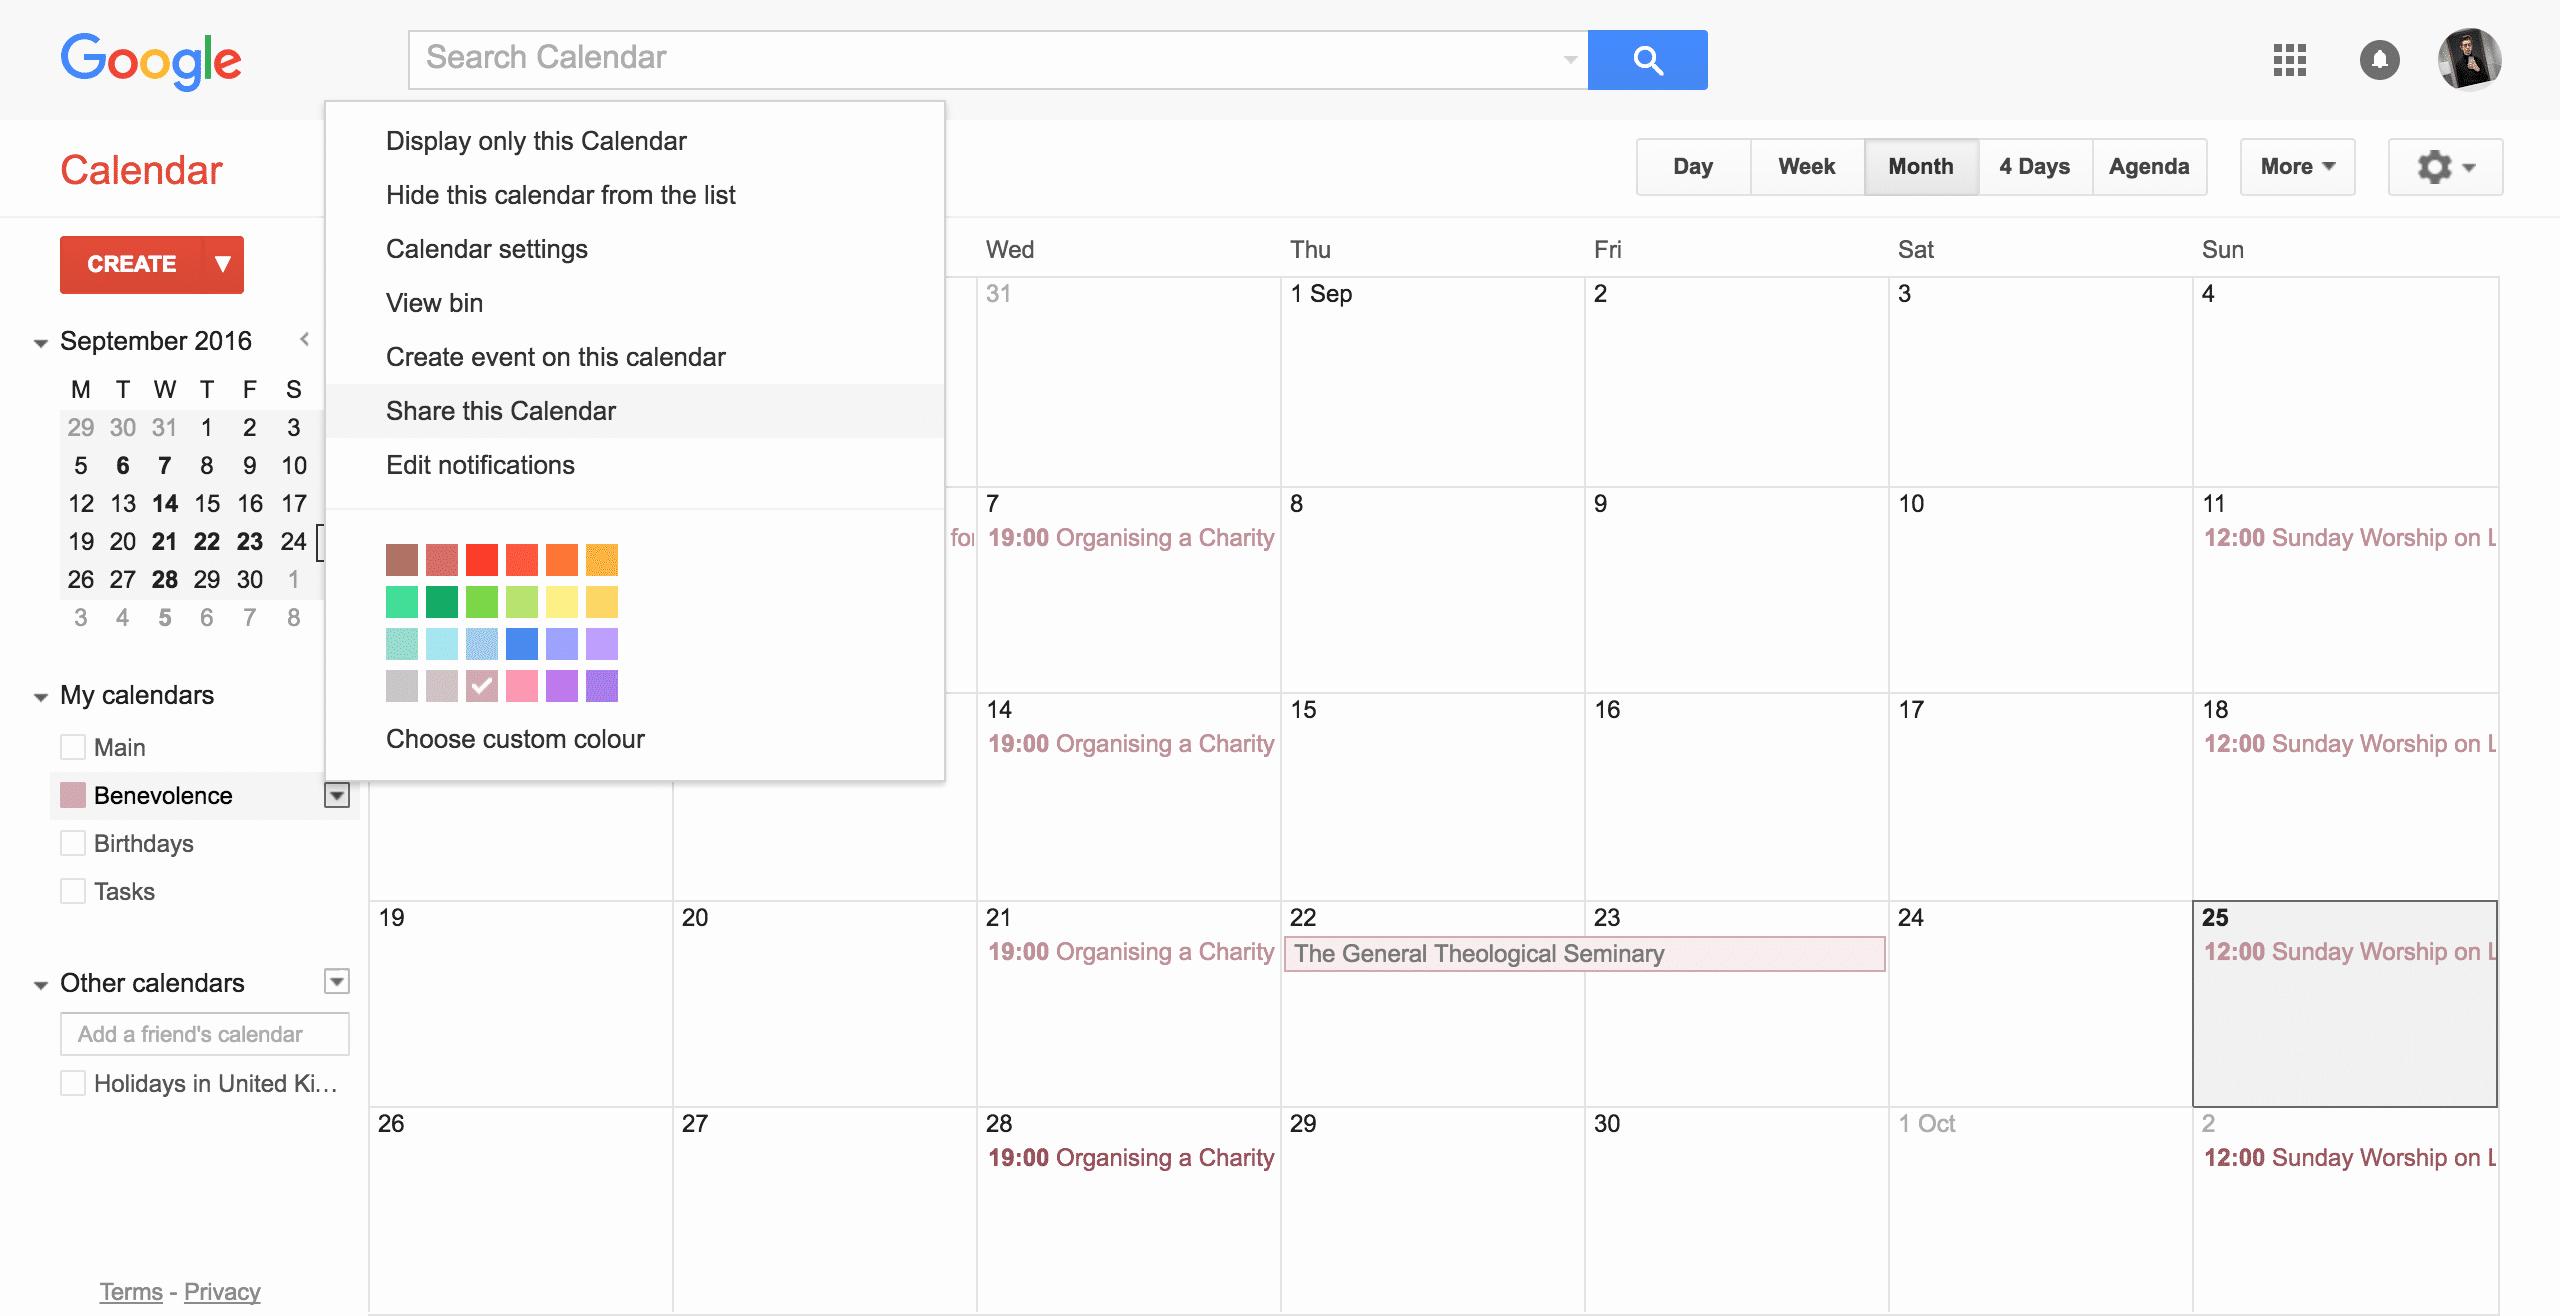 Calendar Template for Google Docs Elegant Calendar Template for Google Docs Calendrier